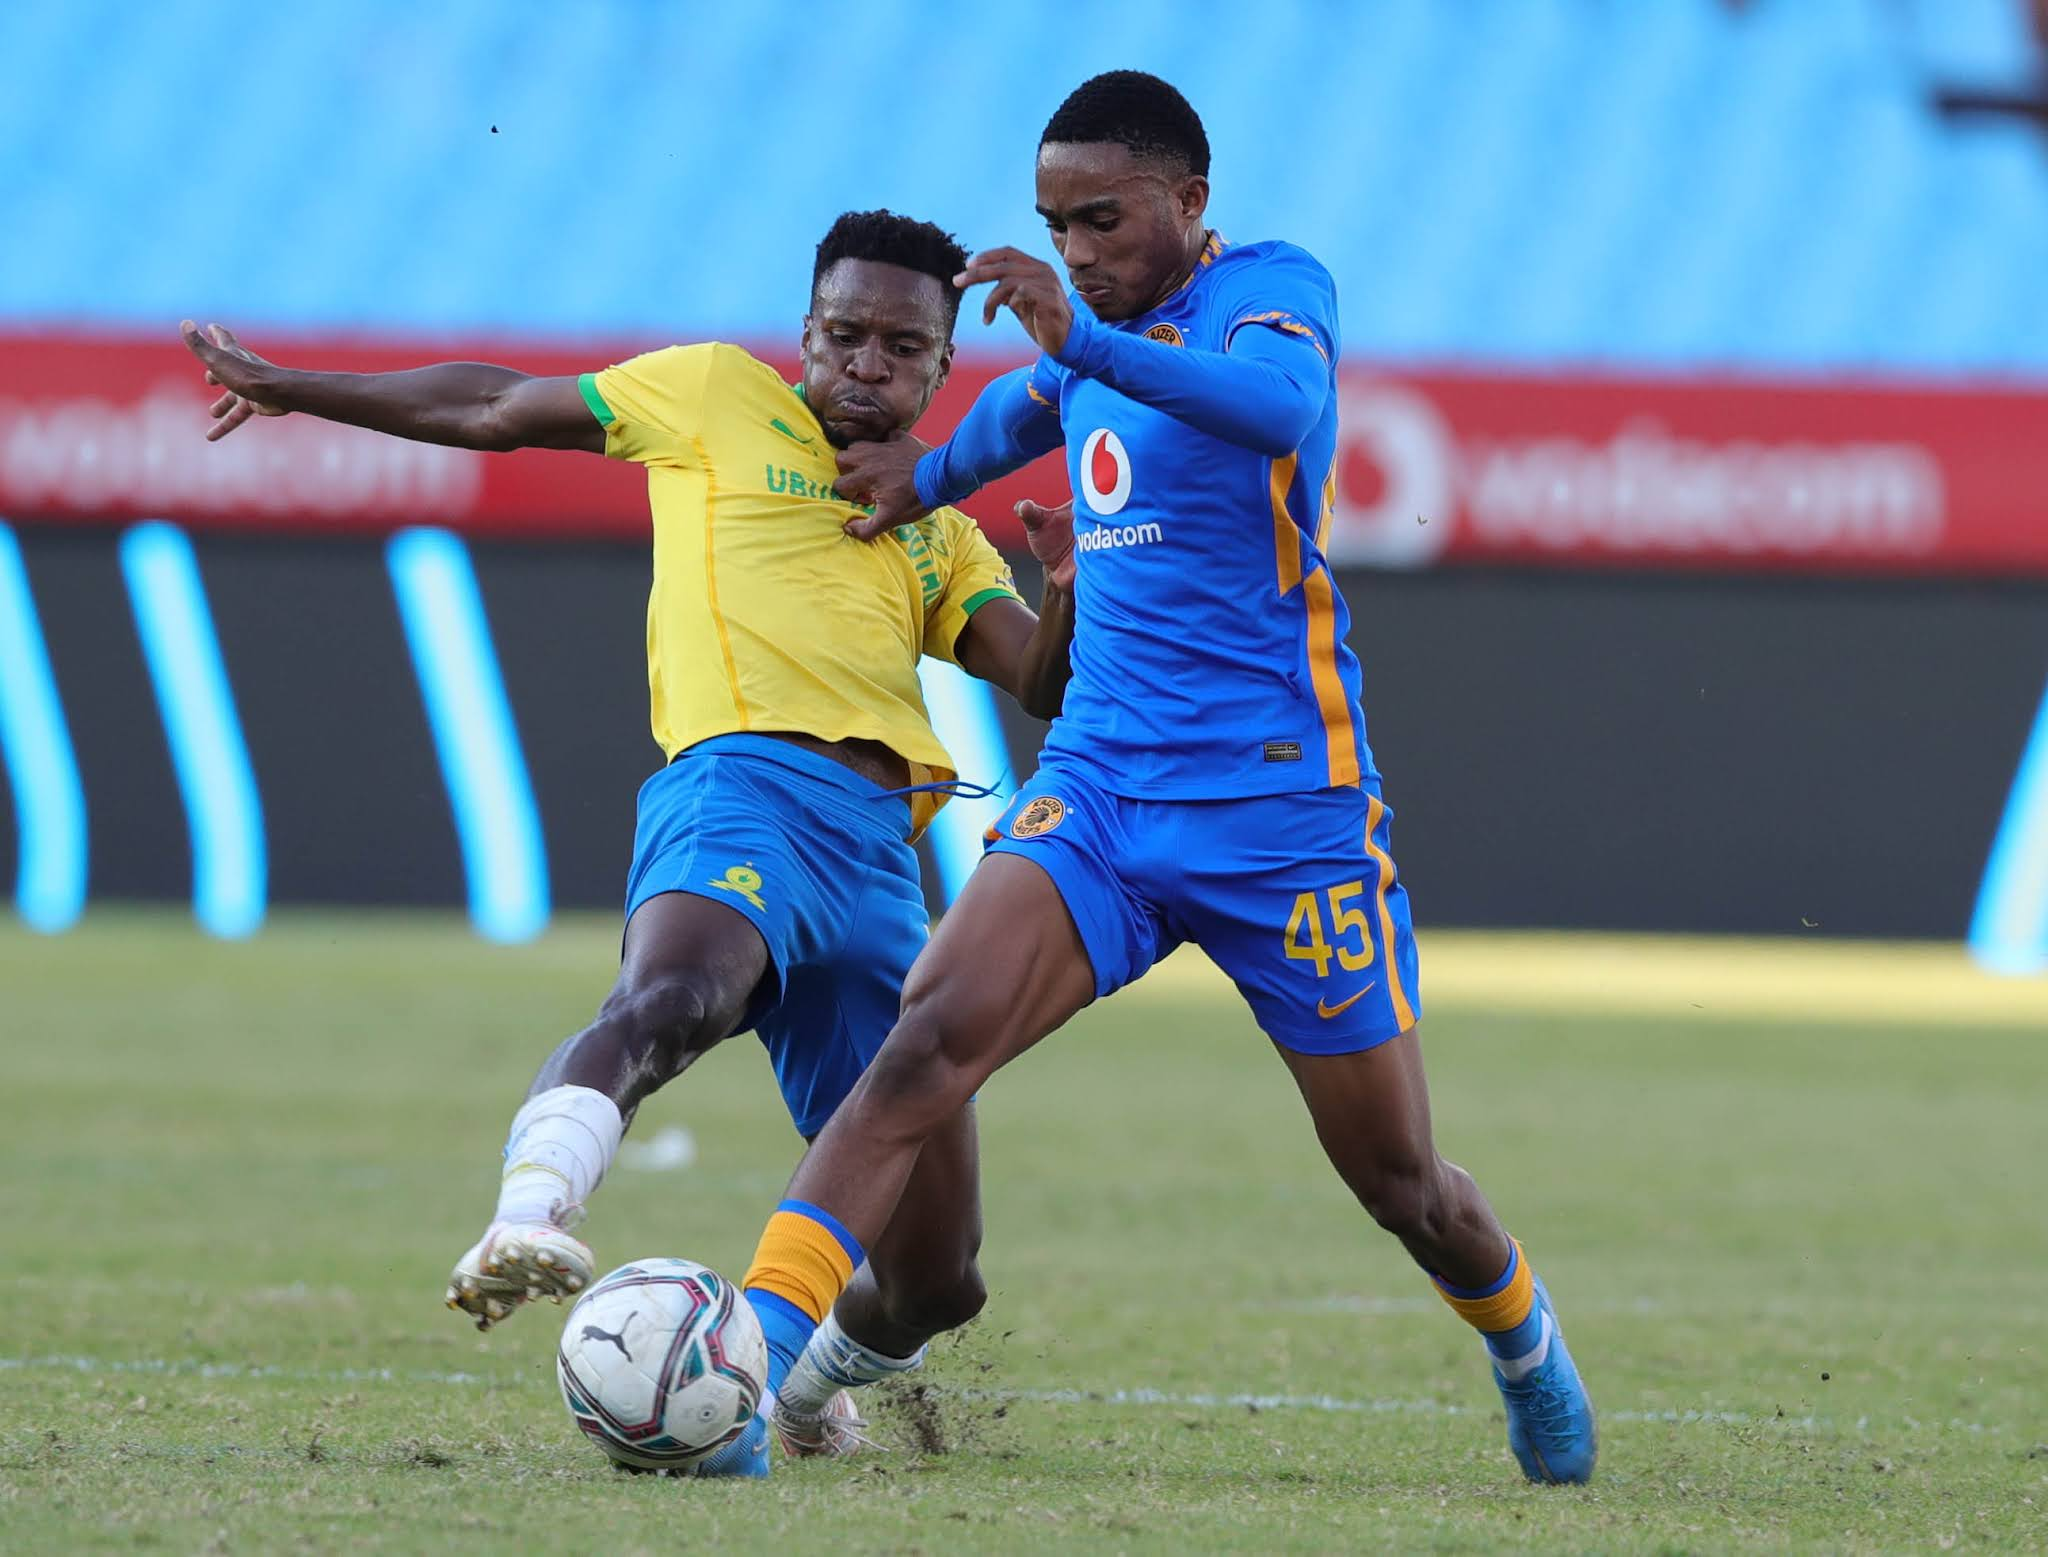 Themba Zwane and Njabulo Blom